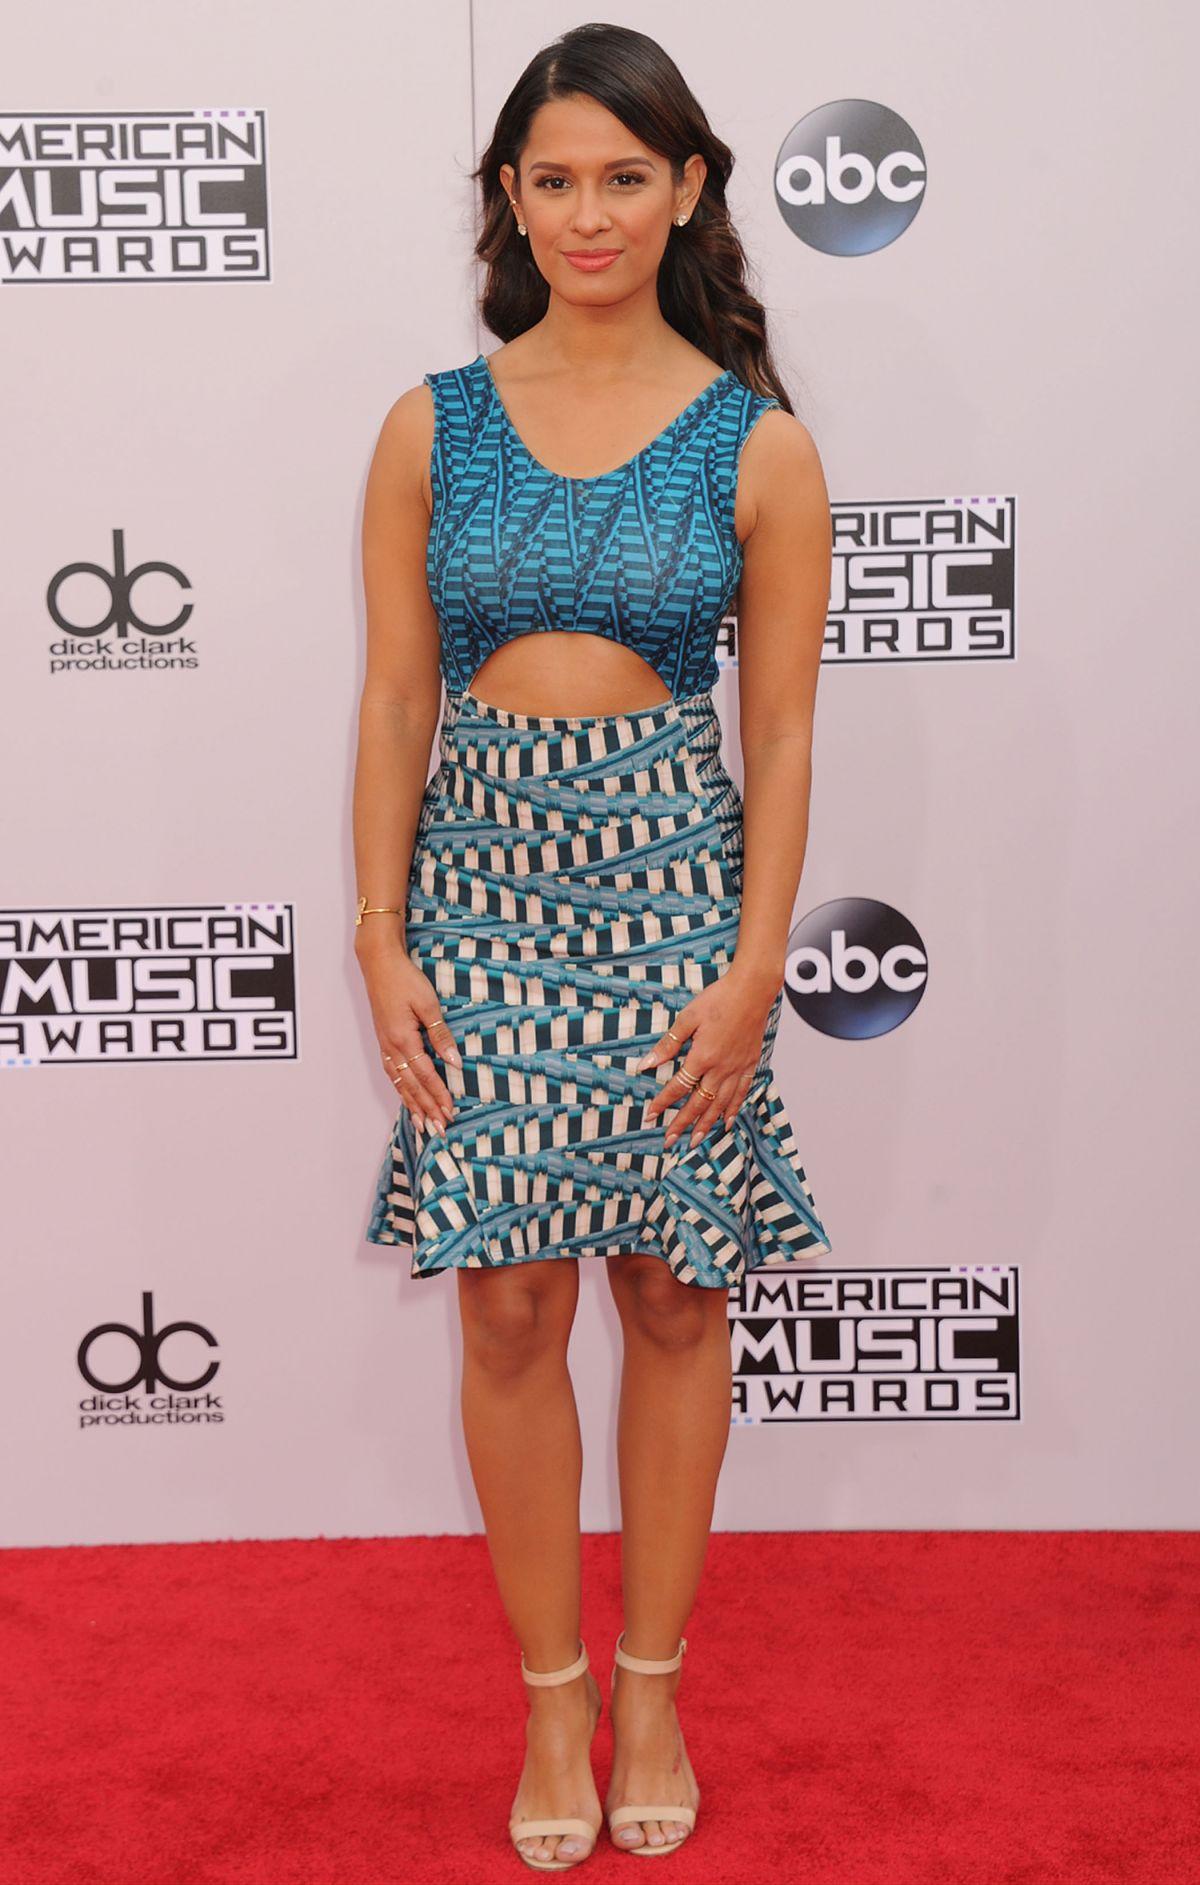 ROCSI DIAZ at 2014 American Music Awards in Los Angeles